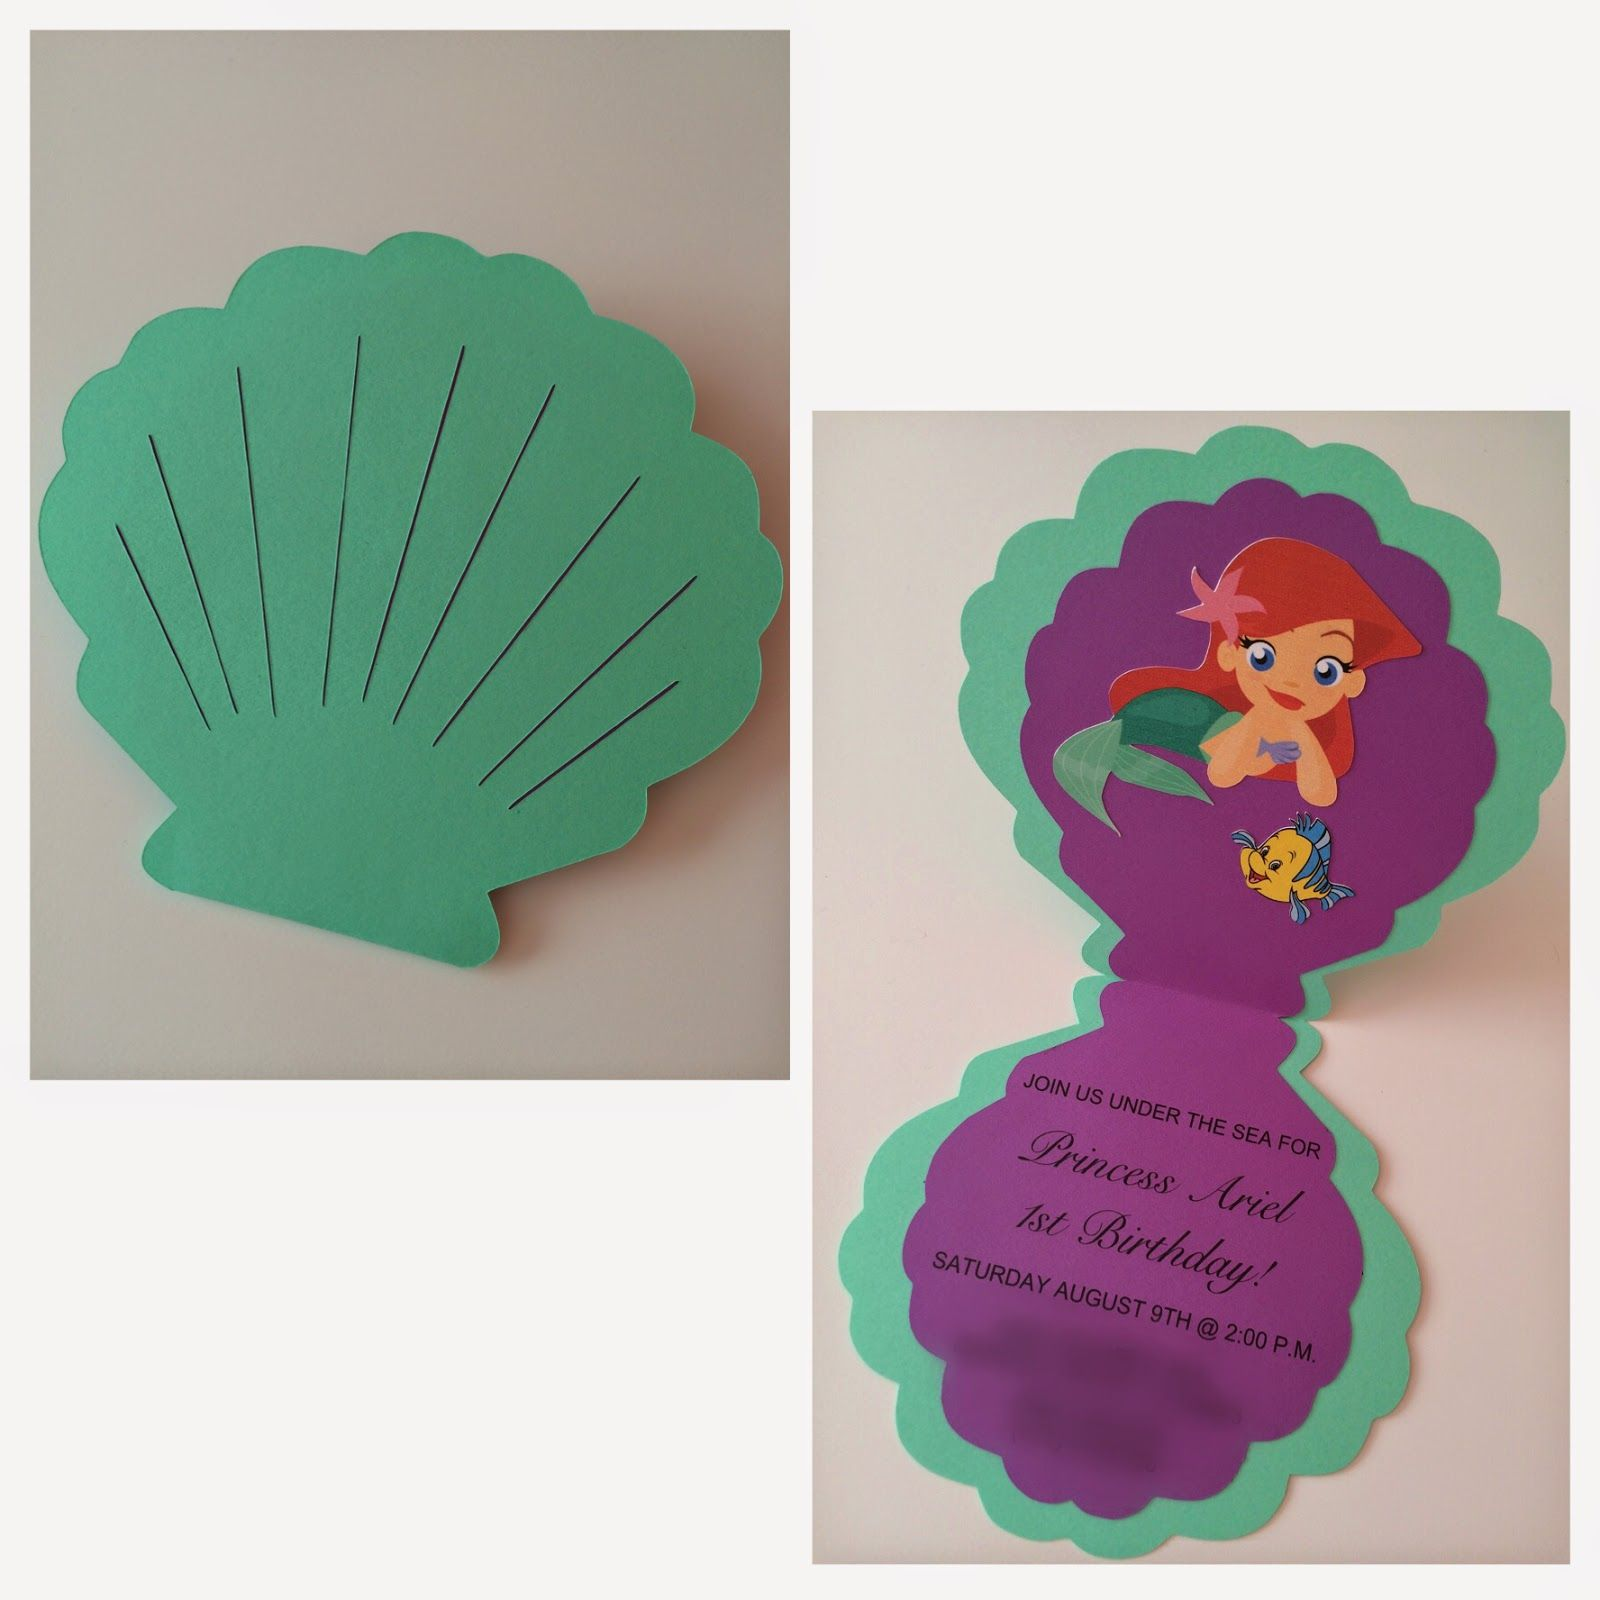 Rockmebeautiful the little mermaid birthday party graphic design